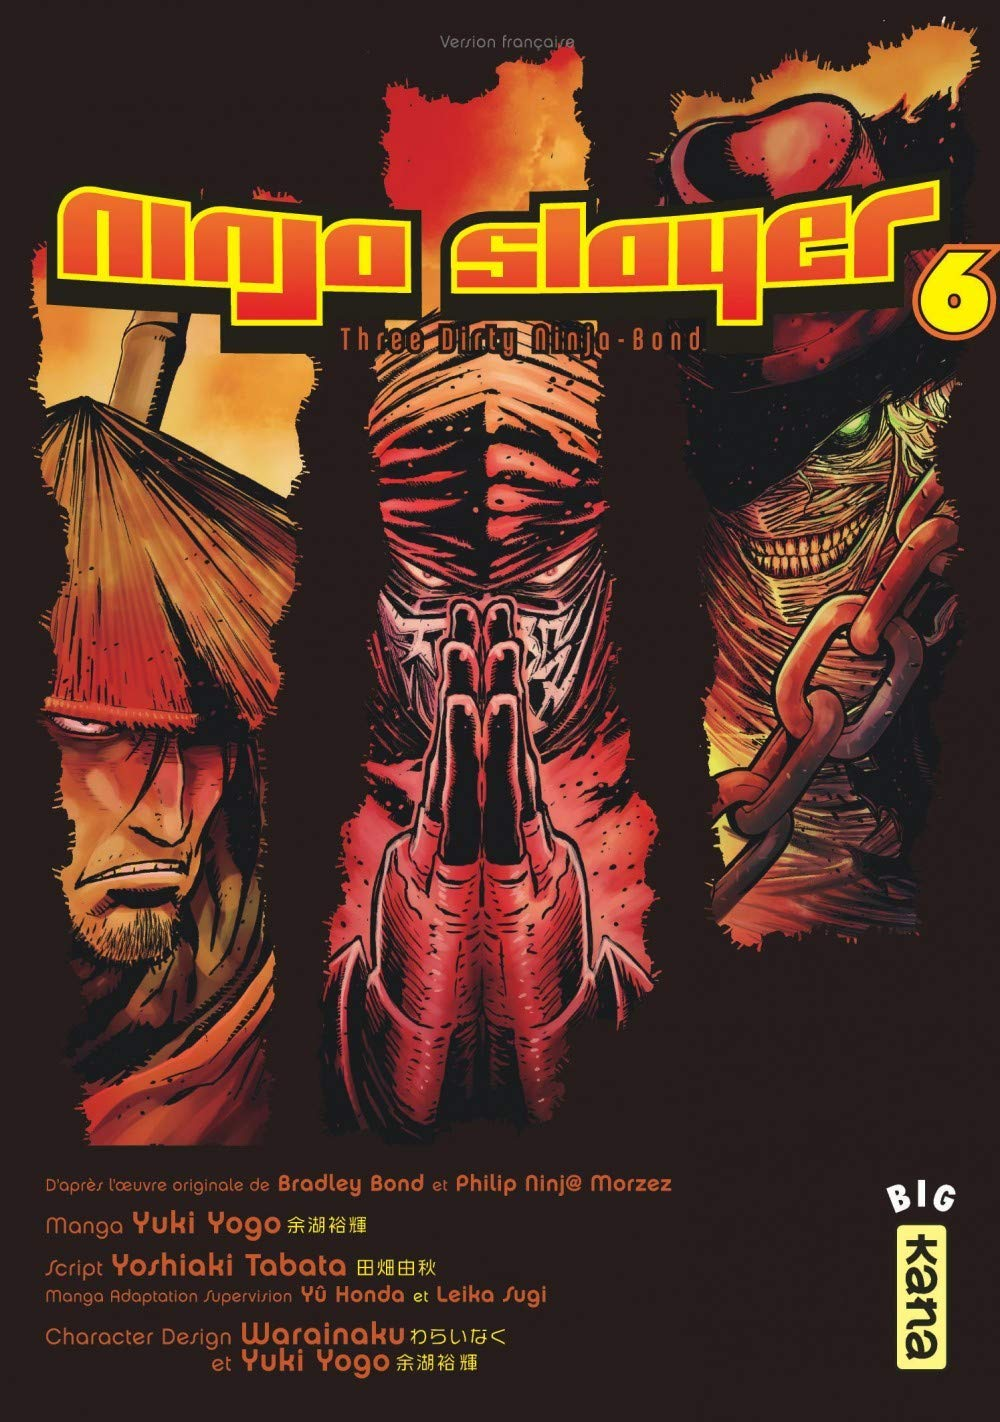 Ninja slayer, tome 6: Amazon.es: Yoshiaki Tabata, Yuki Yogo ...